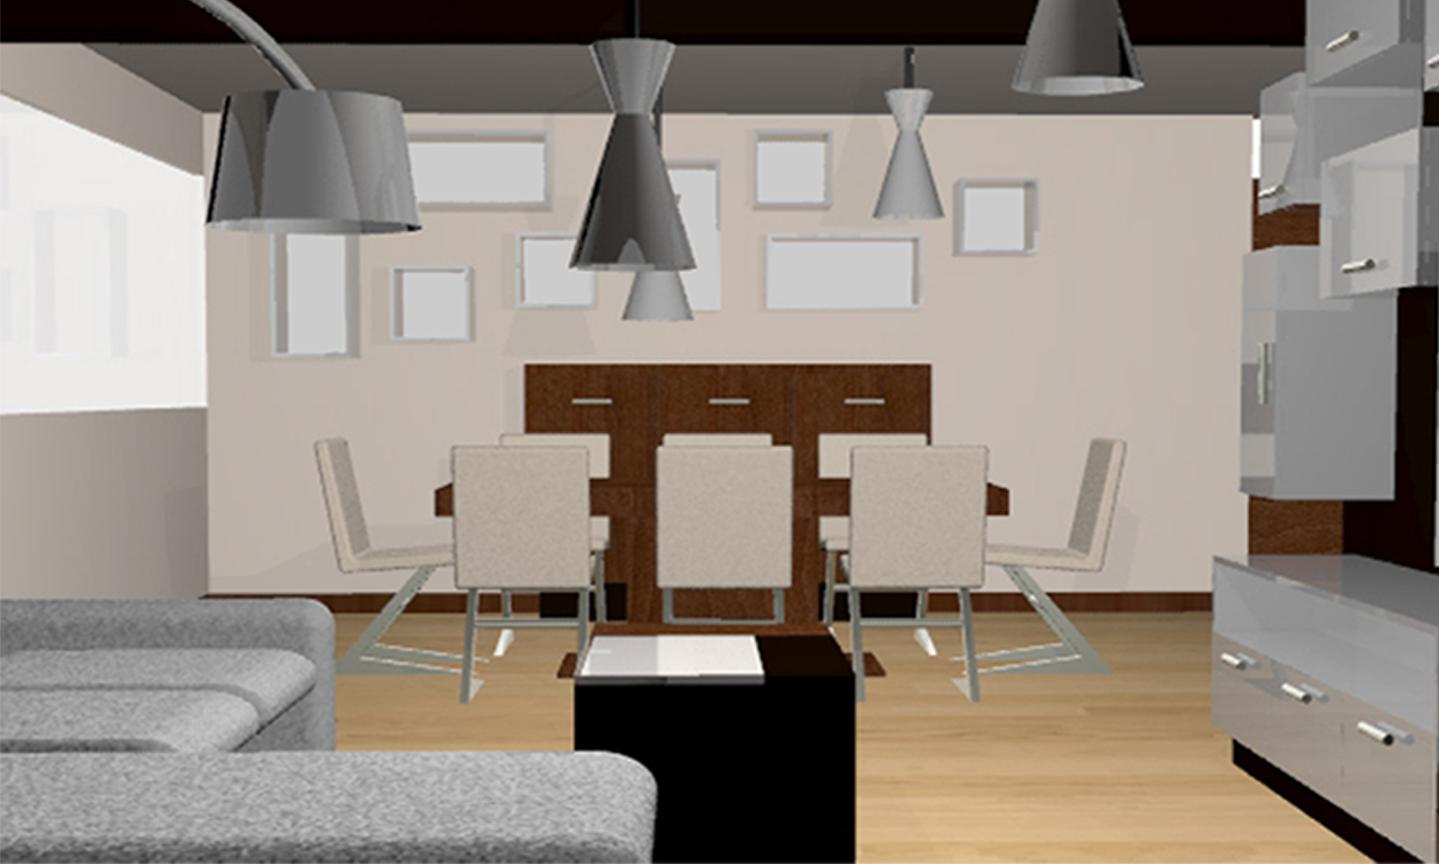 Remodelaci n interior de departamento dise o 3d por for Diseno de interiores mexico